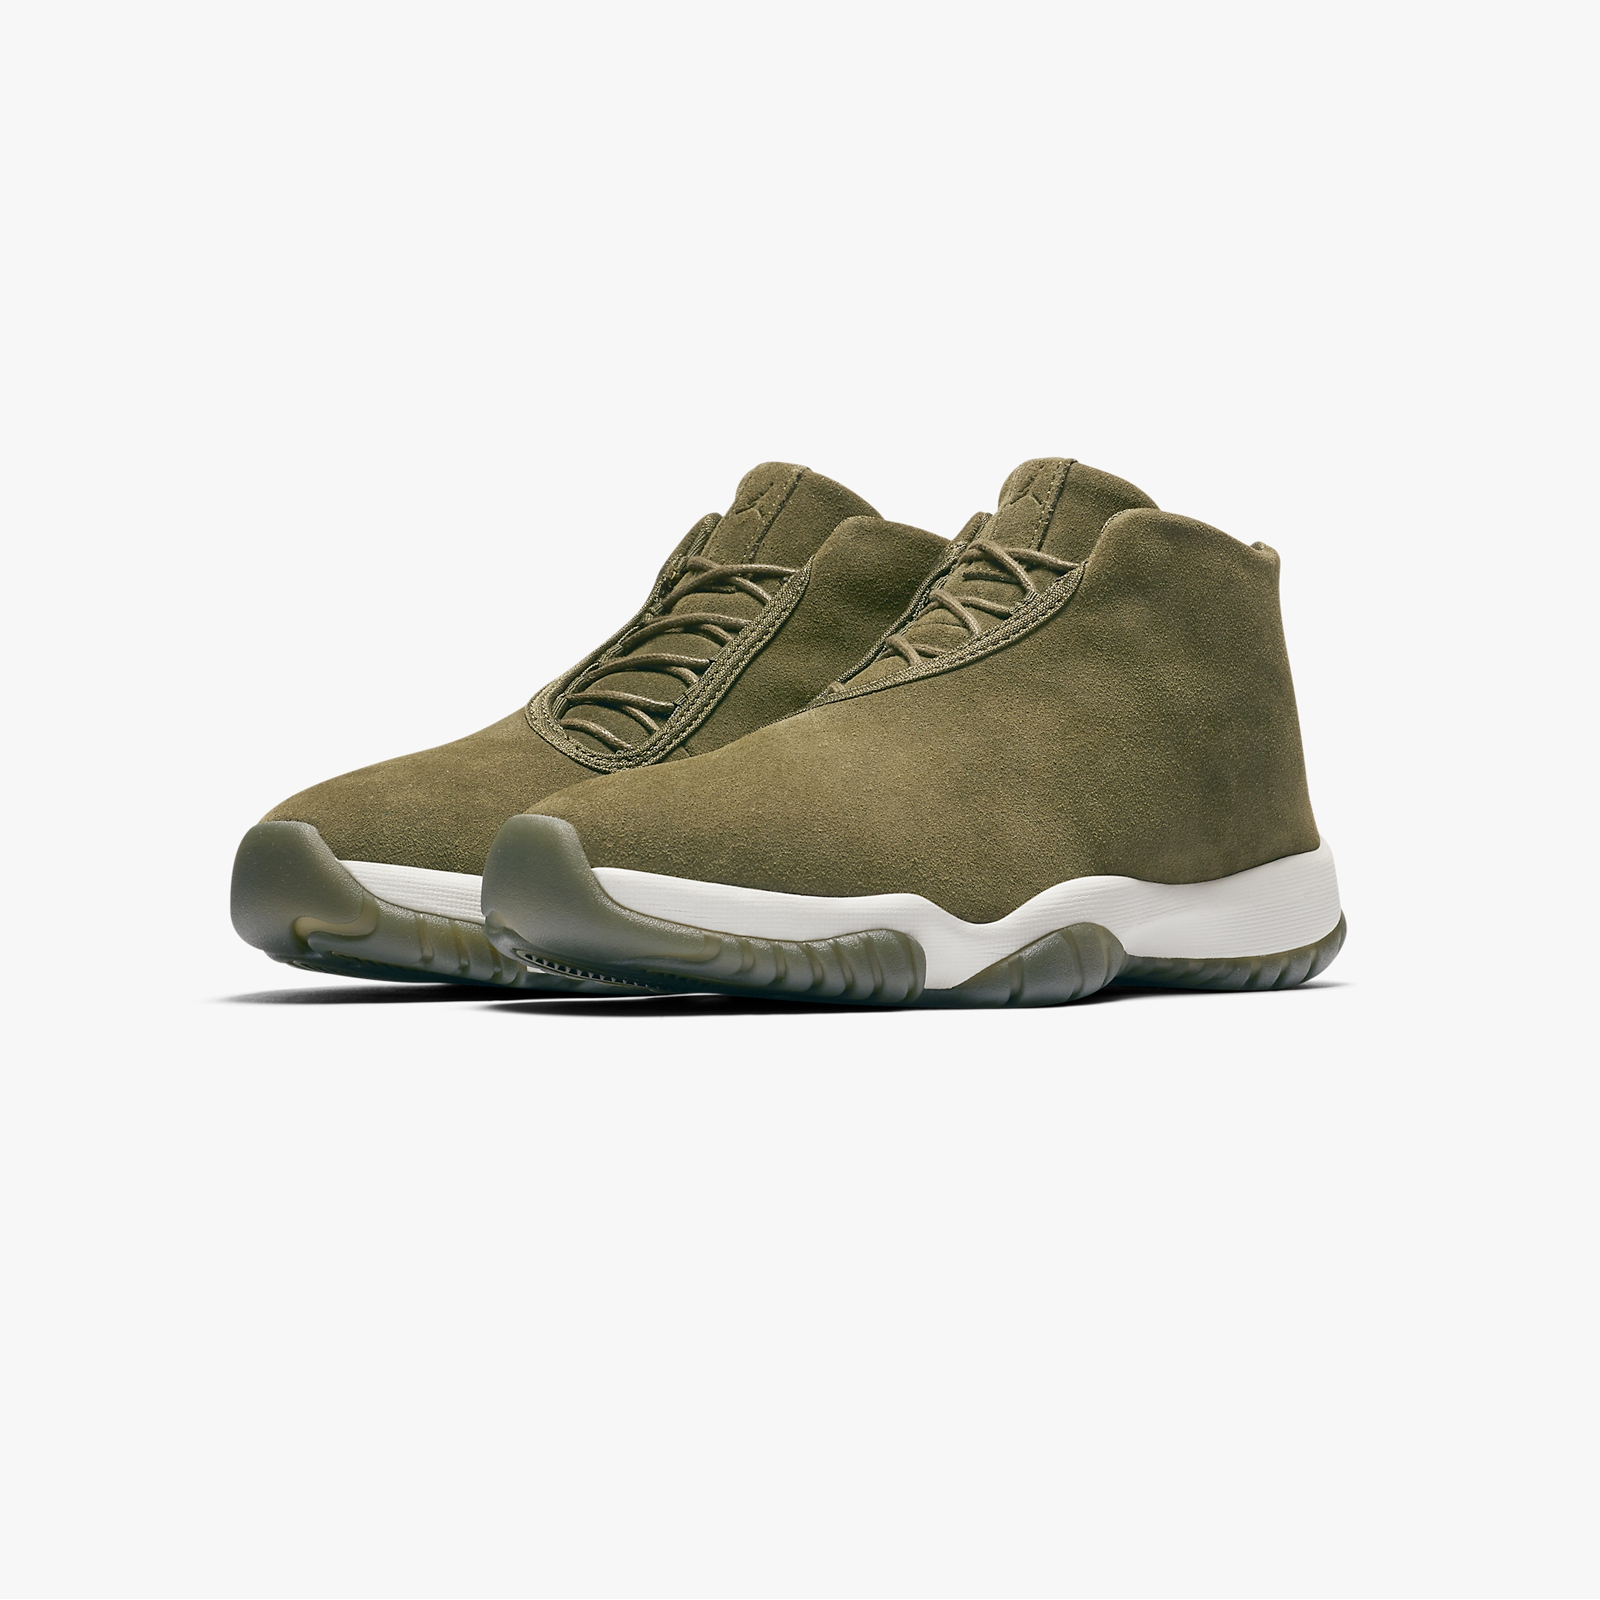 grand choix de 25ac0 6368e Jordan Brand Air Jordan Future - Ar0726-300 - Sneakersnstuff ...